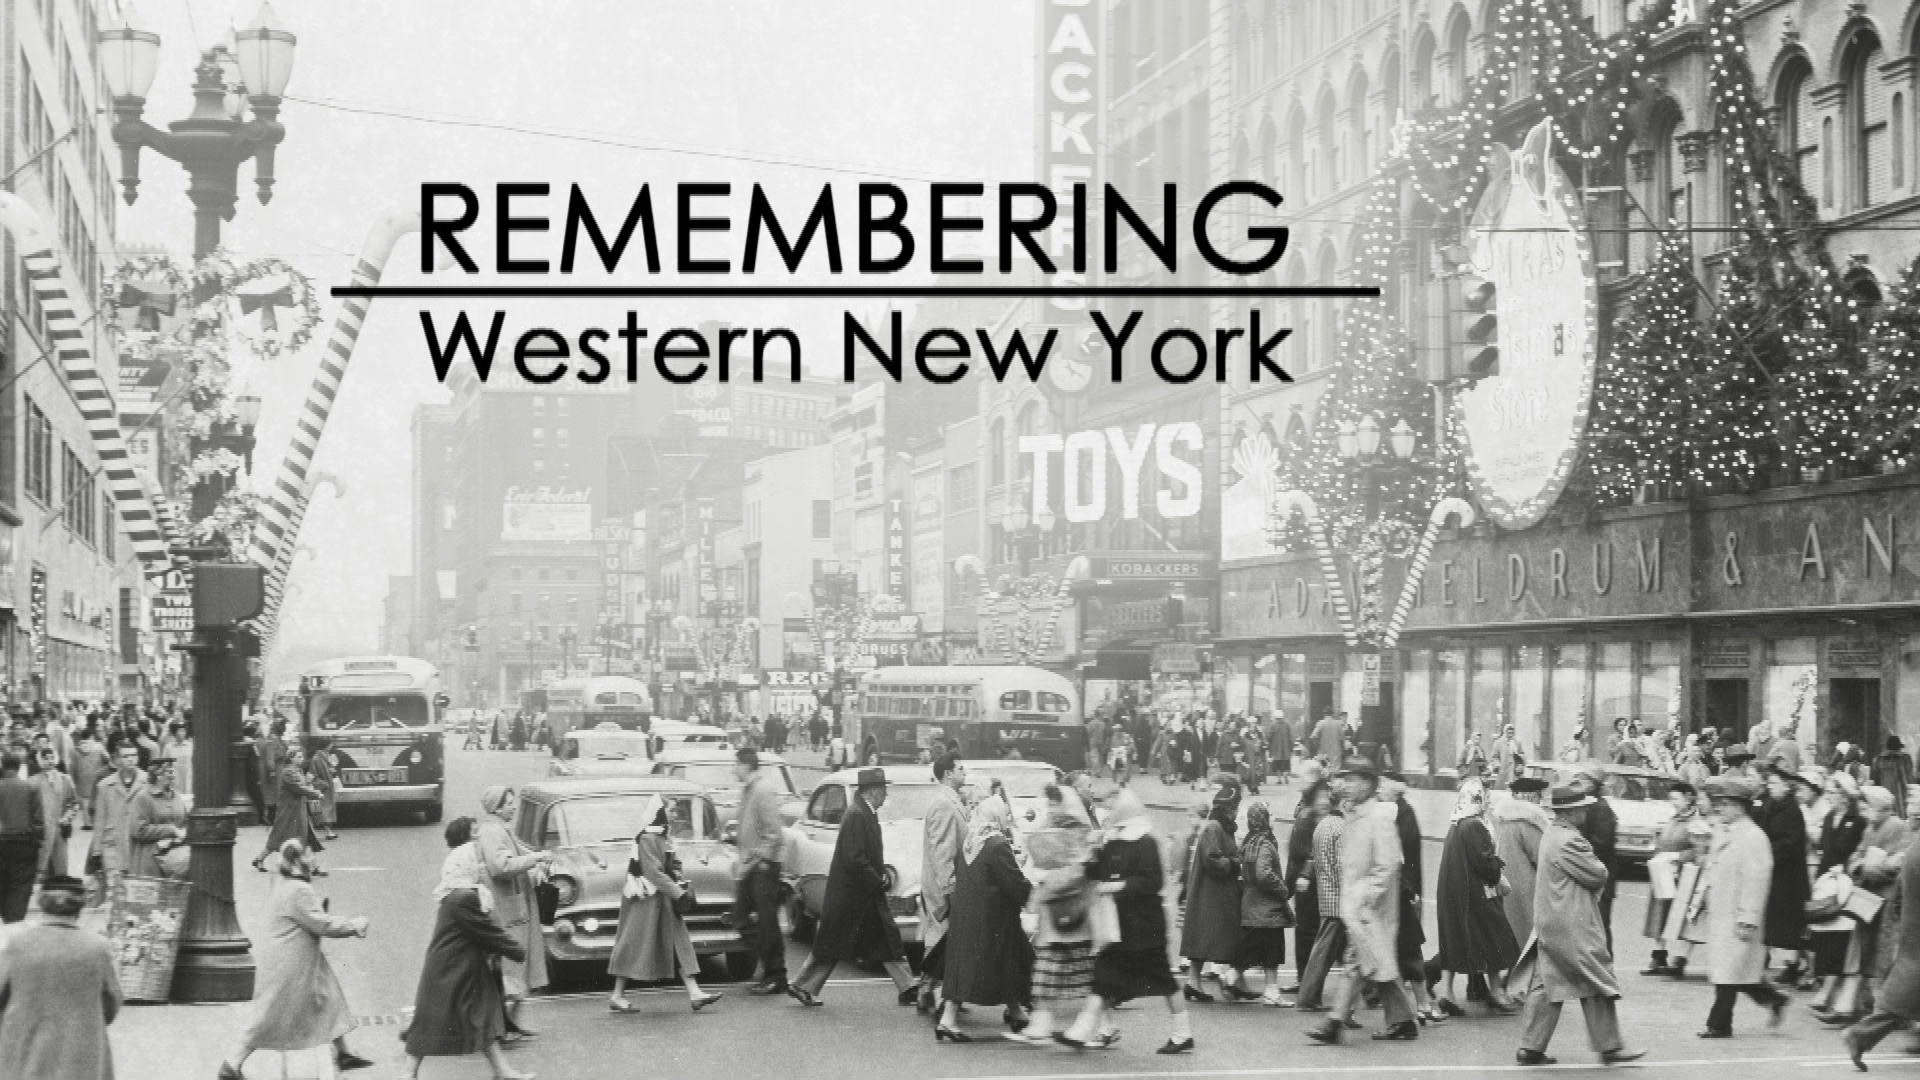 Remembering Western New York